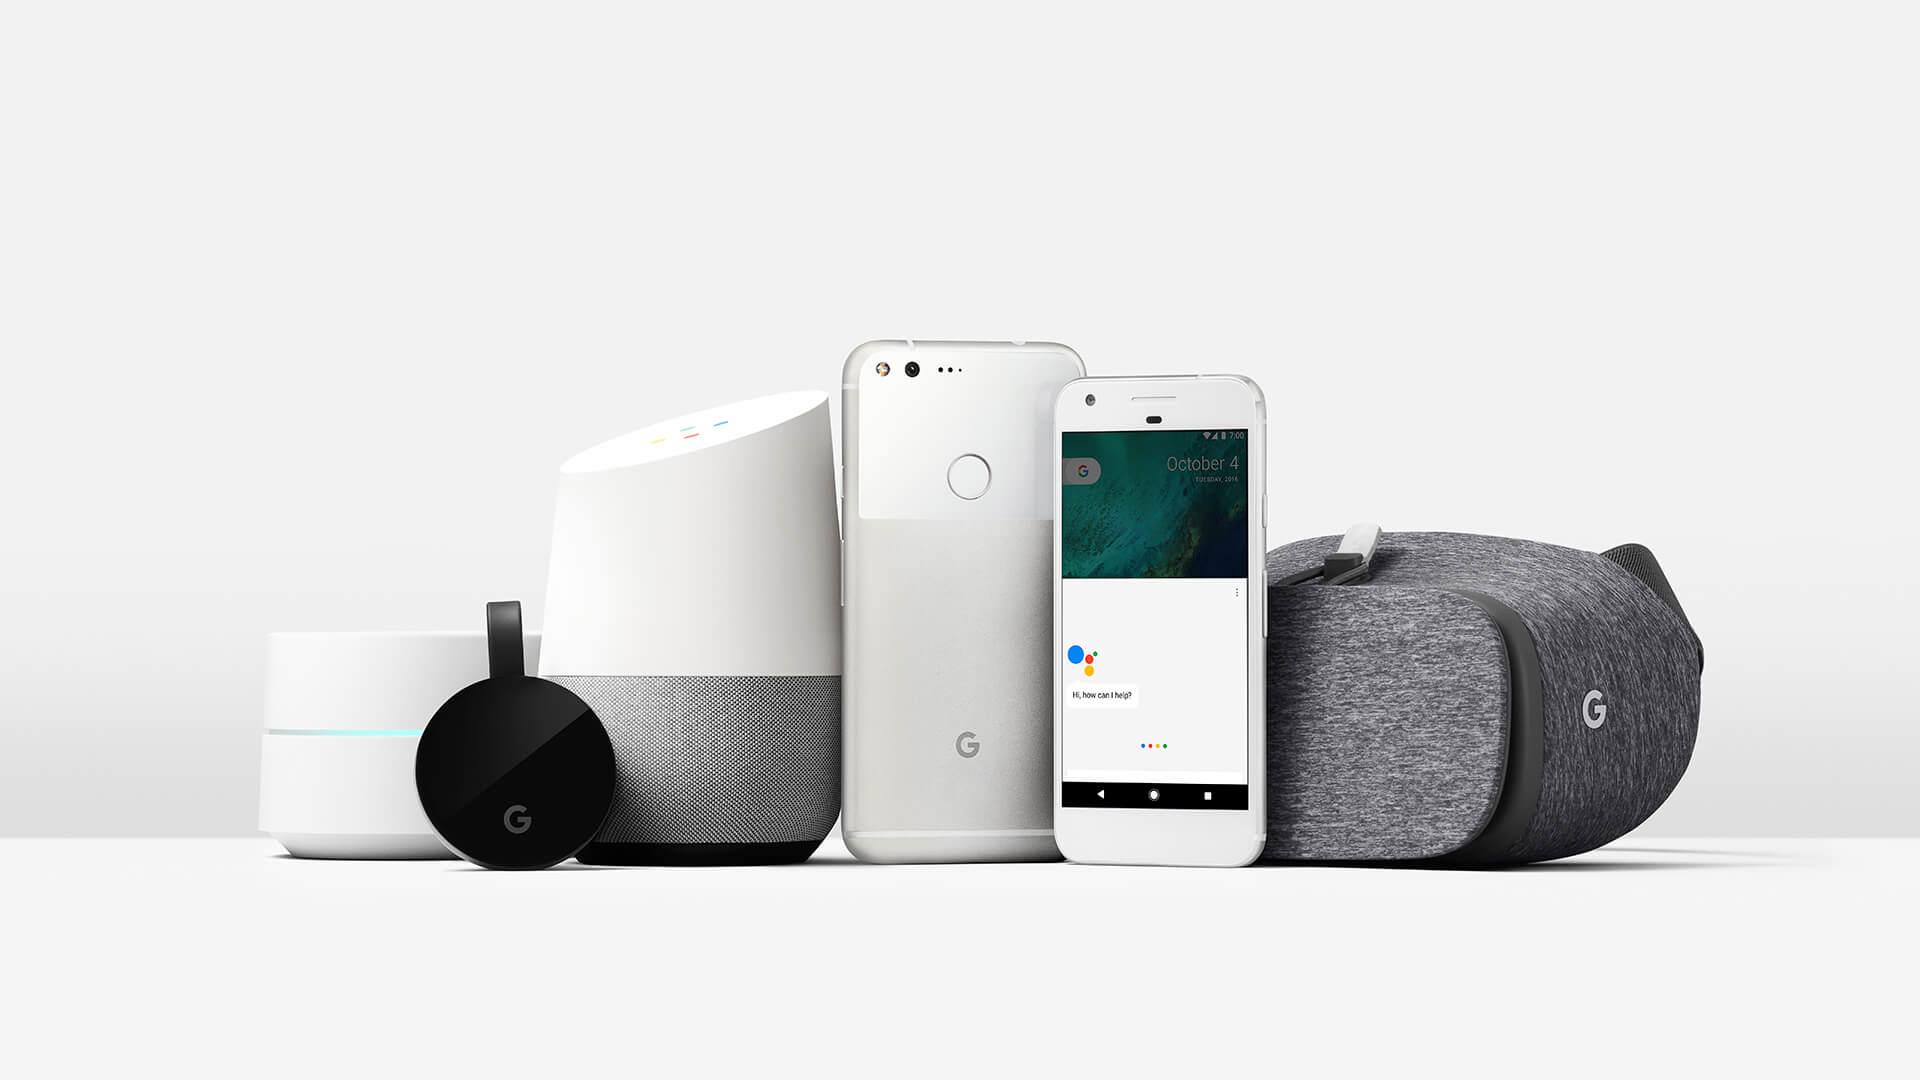 Google-debuts-new-Pixel-phone-Google-Home-Google-Assistant-http-feeds-marketingland-com-r-mkti-wallpaper-wp3606295